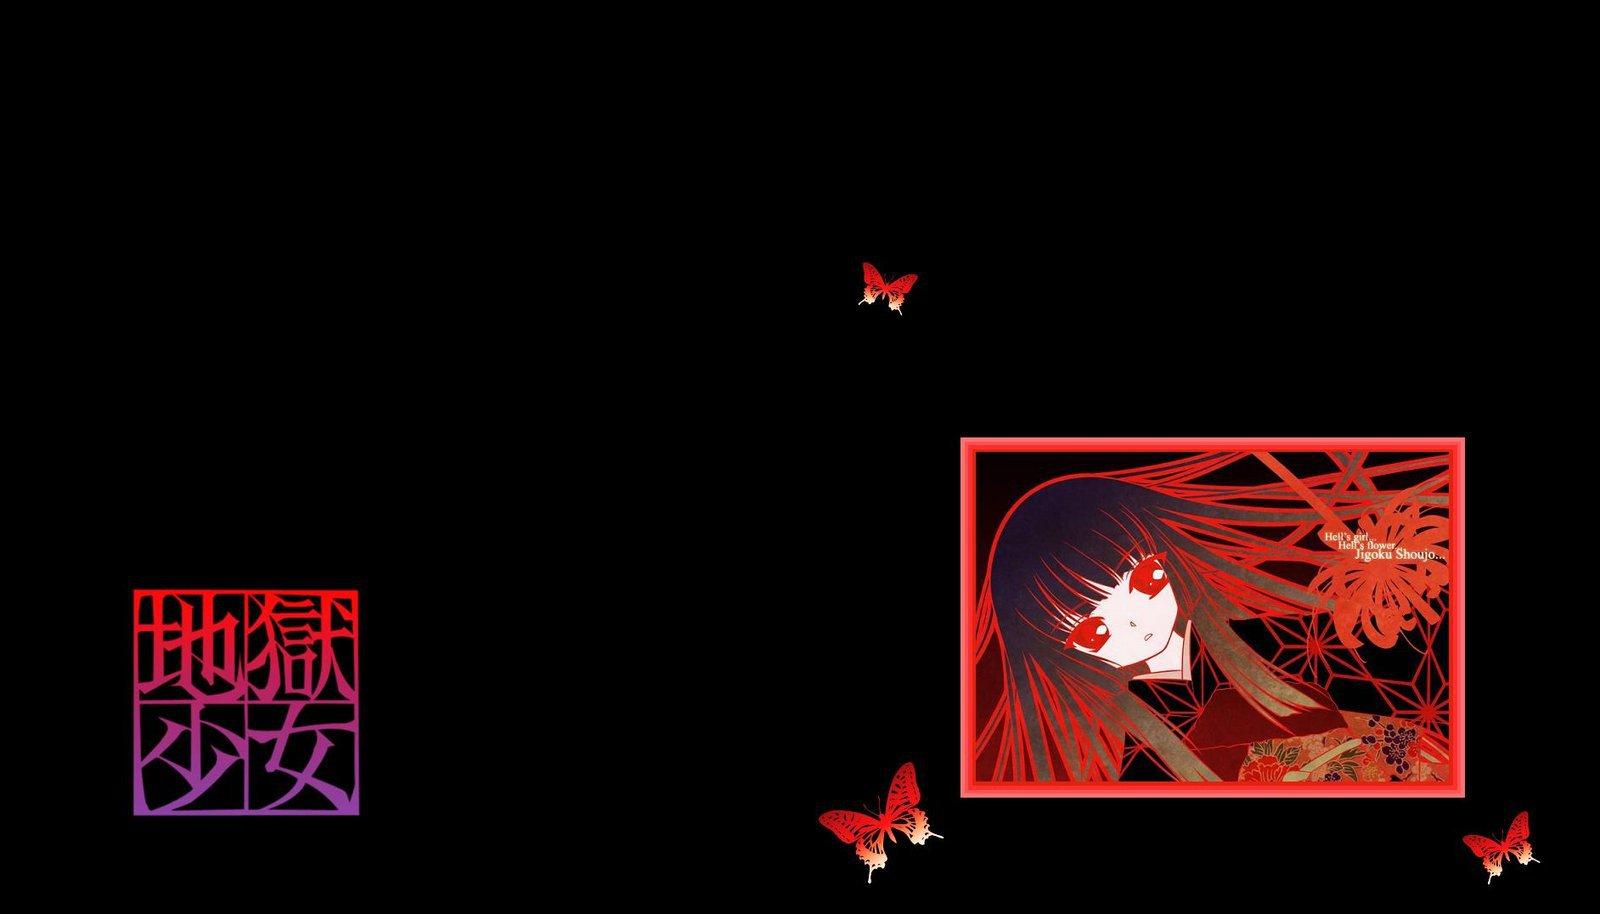 hell girl wallpaper enma ai 8 by shaluXangeljpg 1600x914